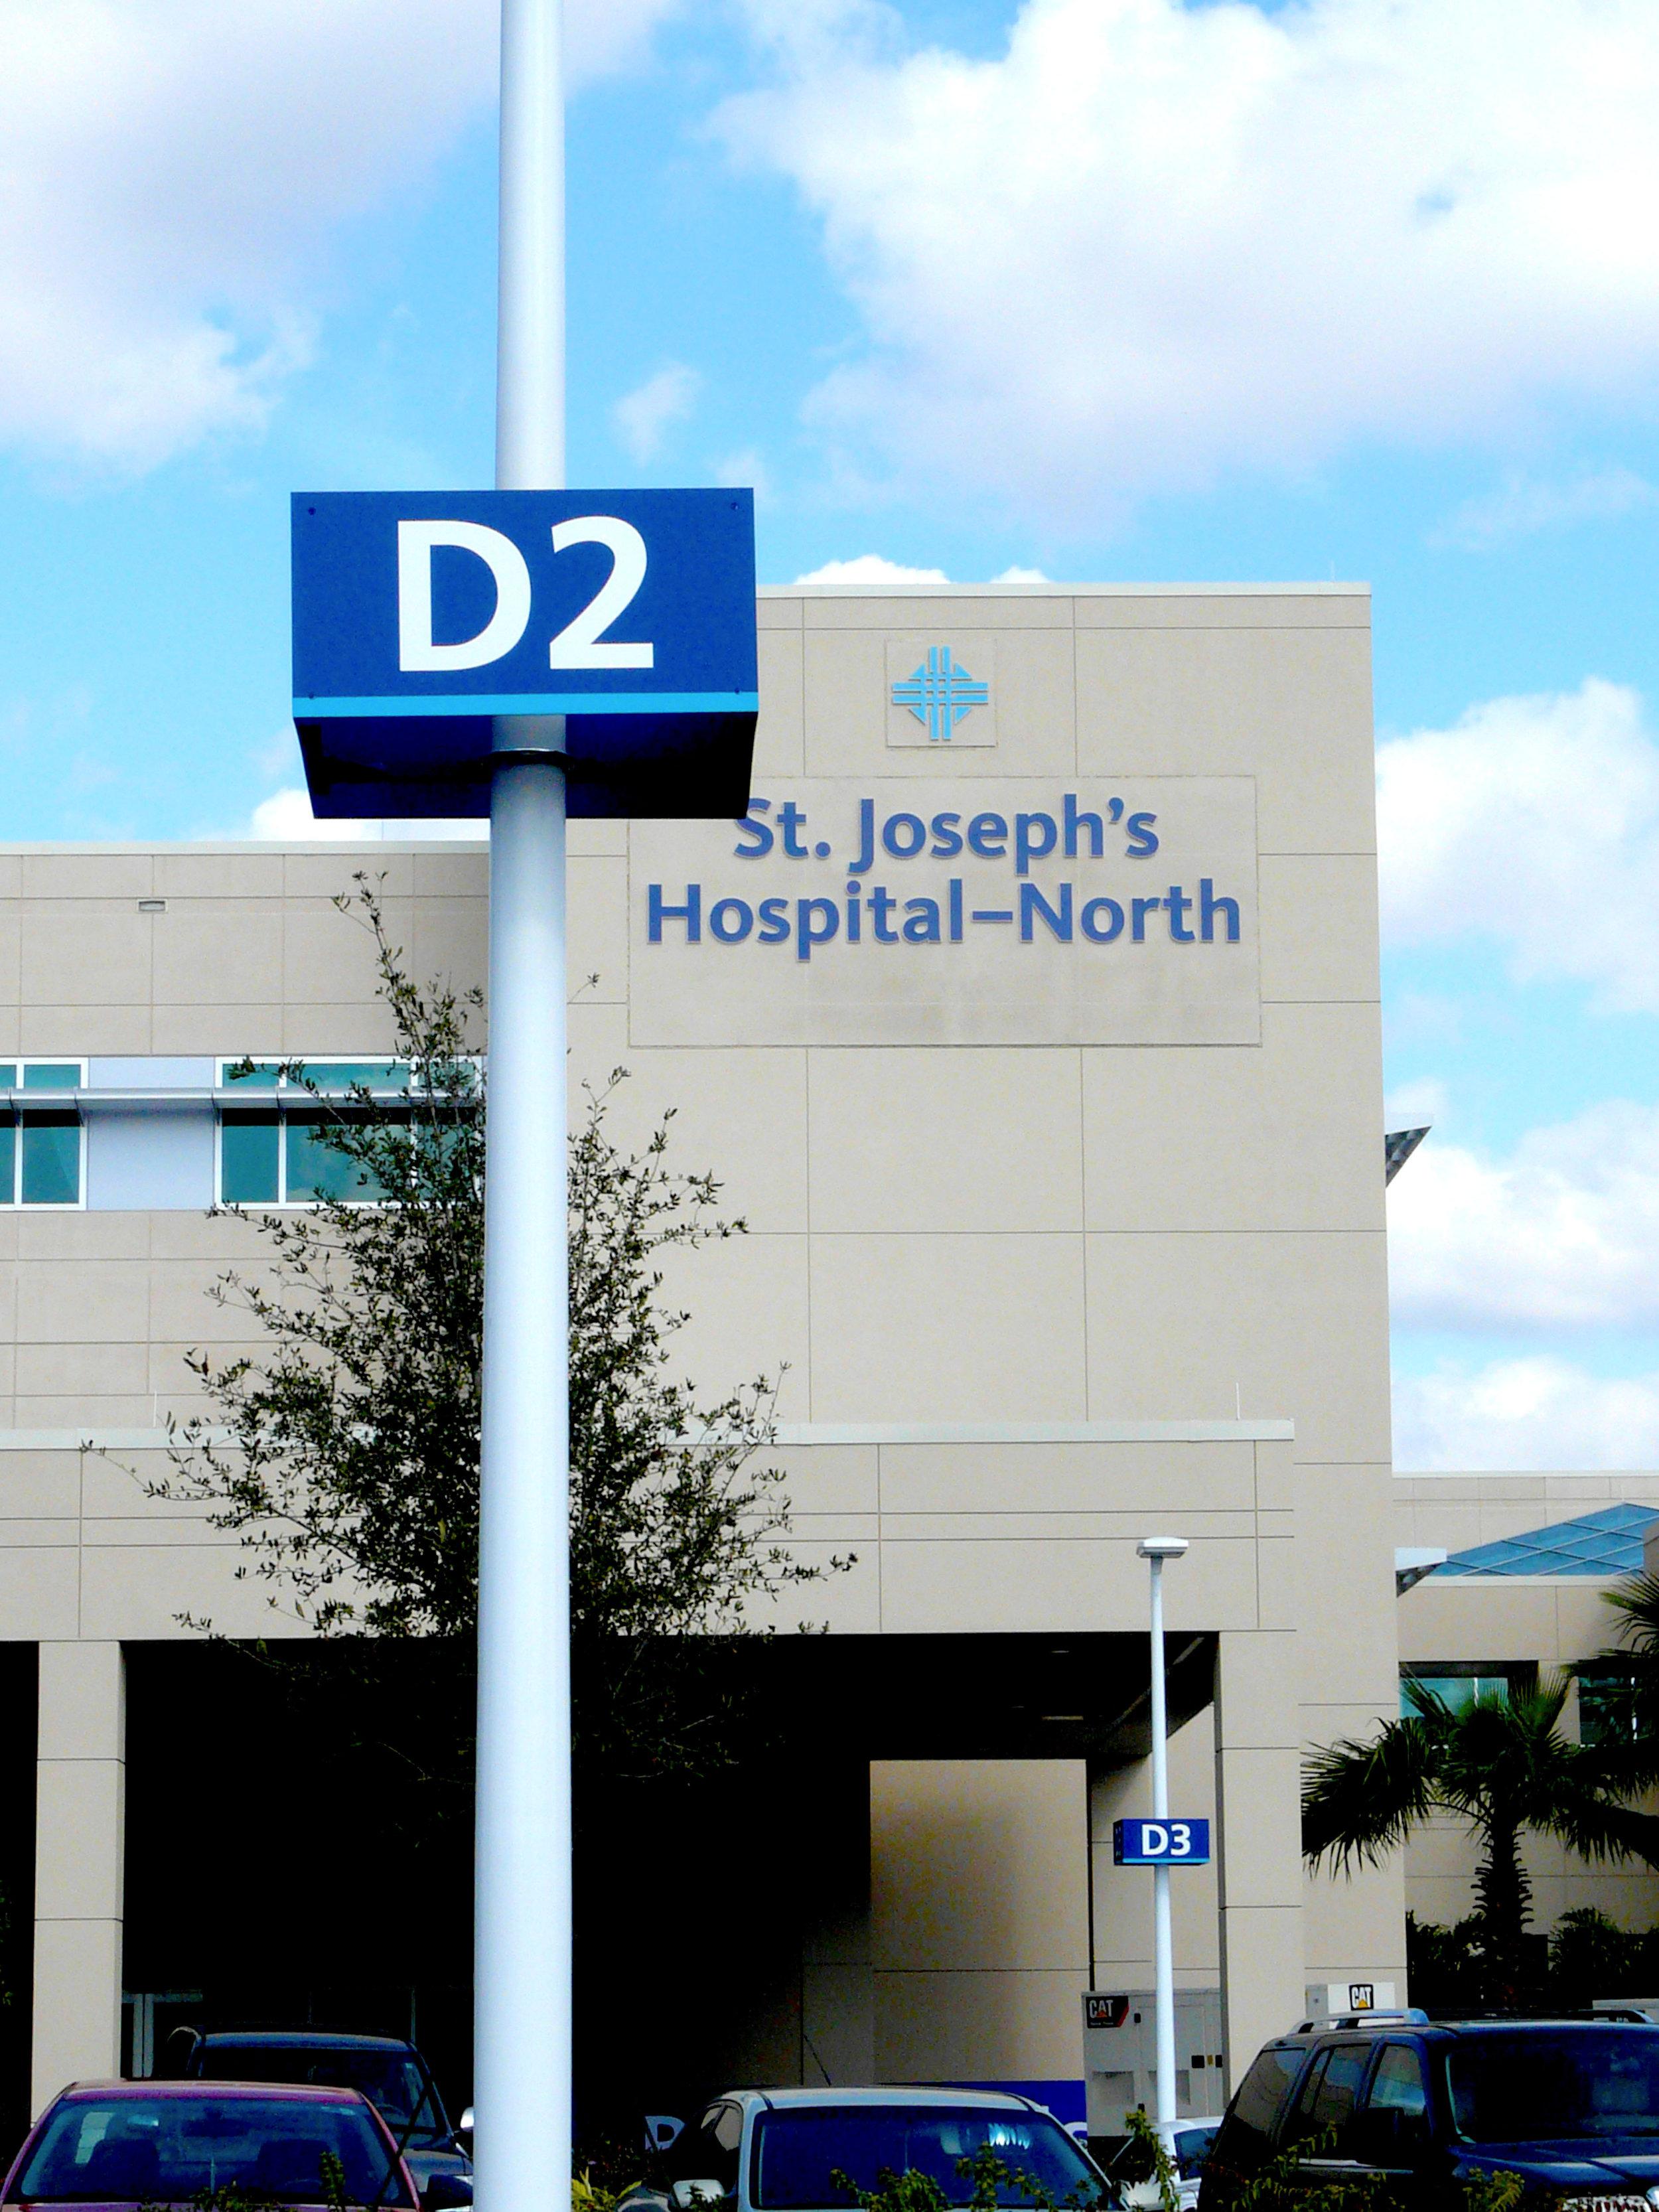 hospital wayfinding signage exterior.jpg